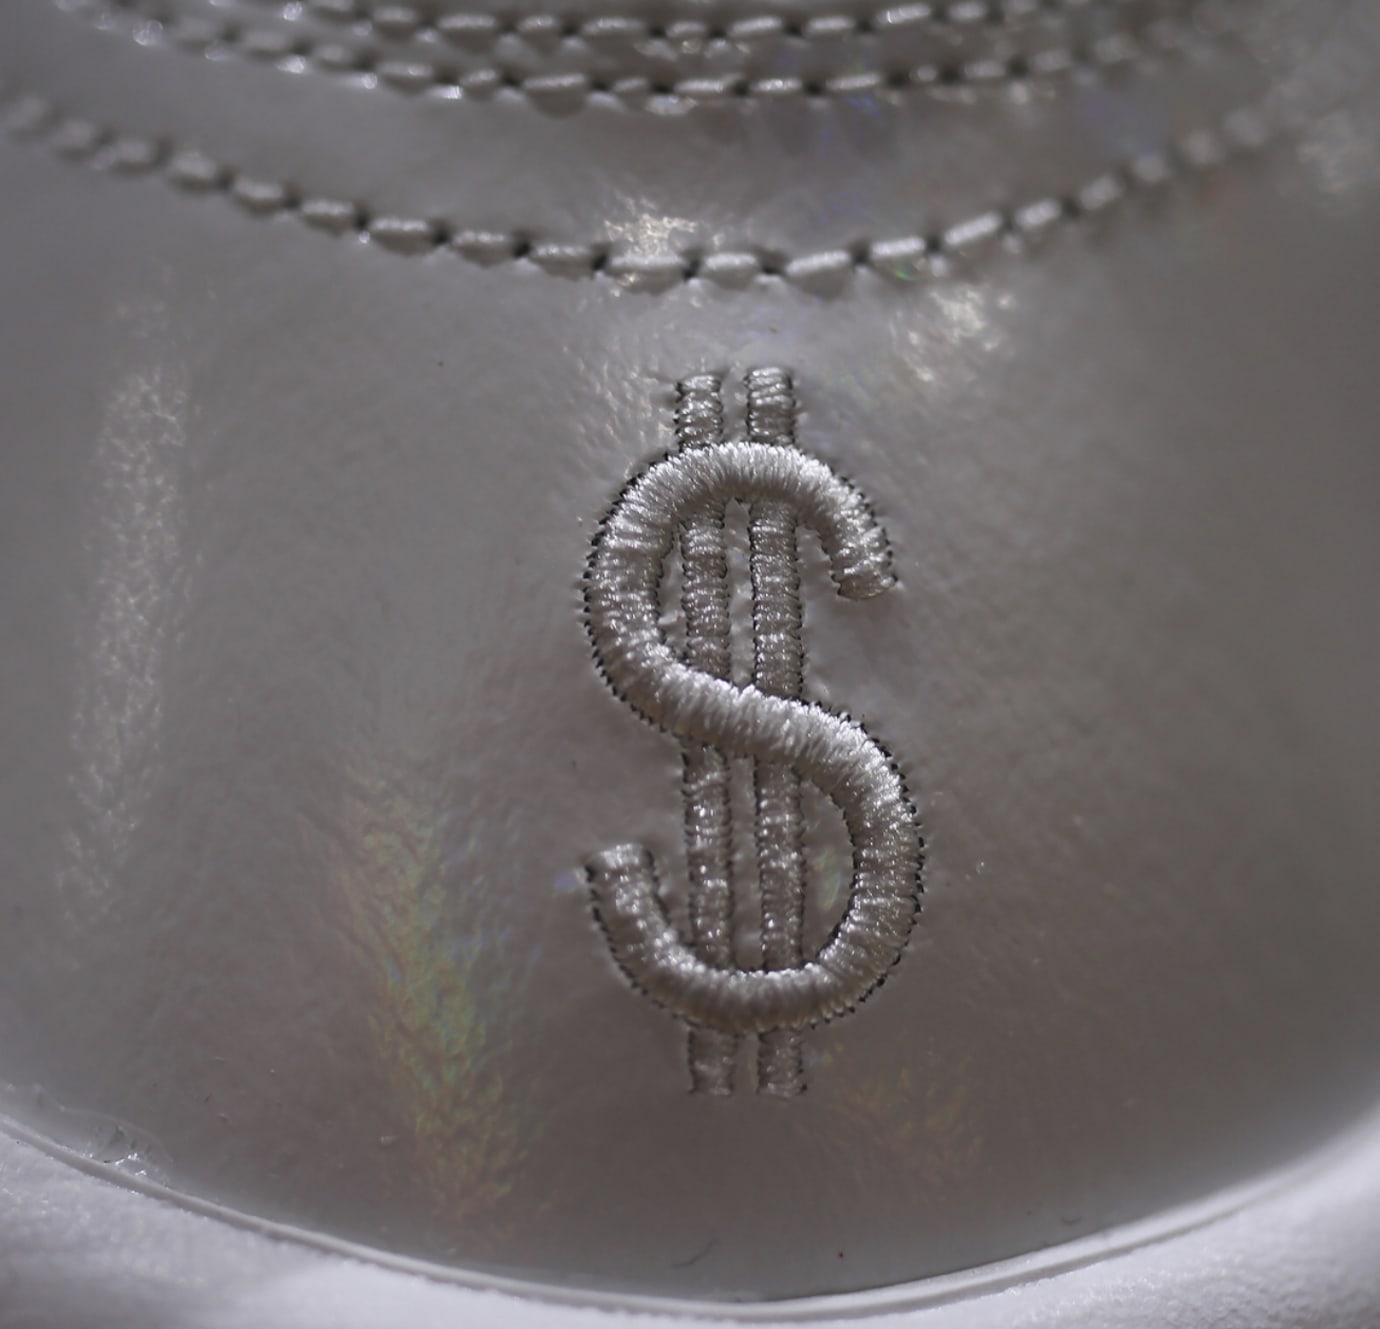 Nike Air More Money 'White/Los Angeles' (Detail)